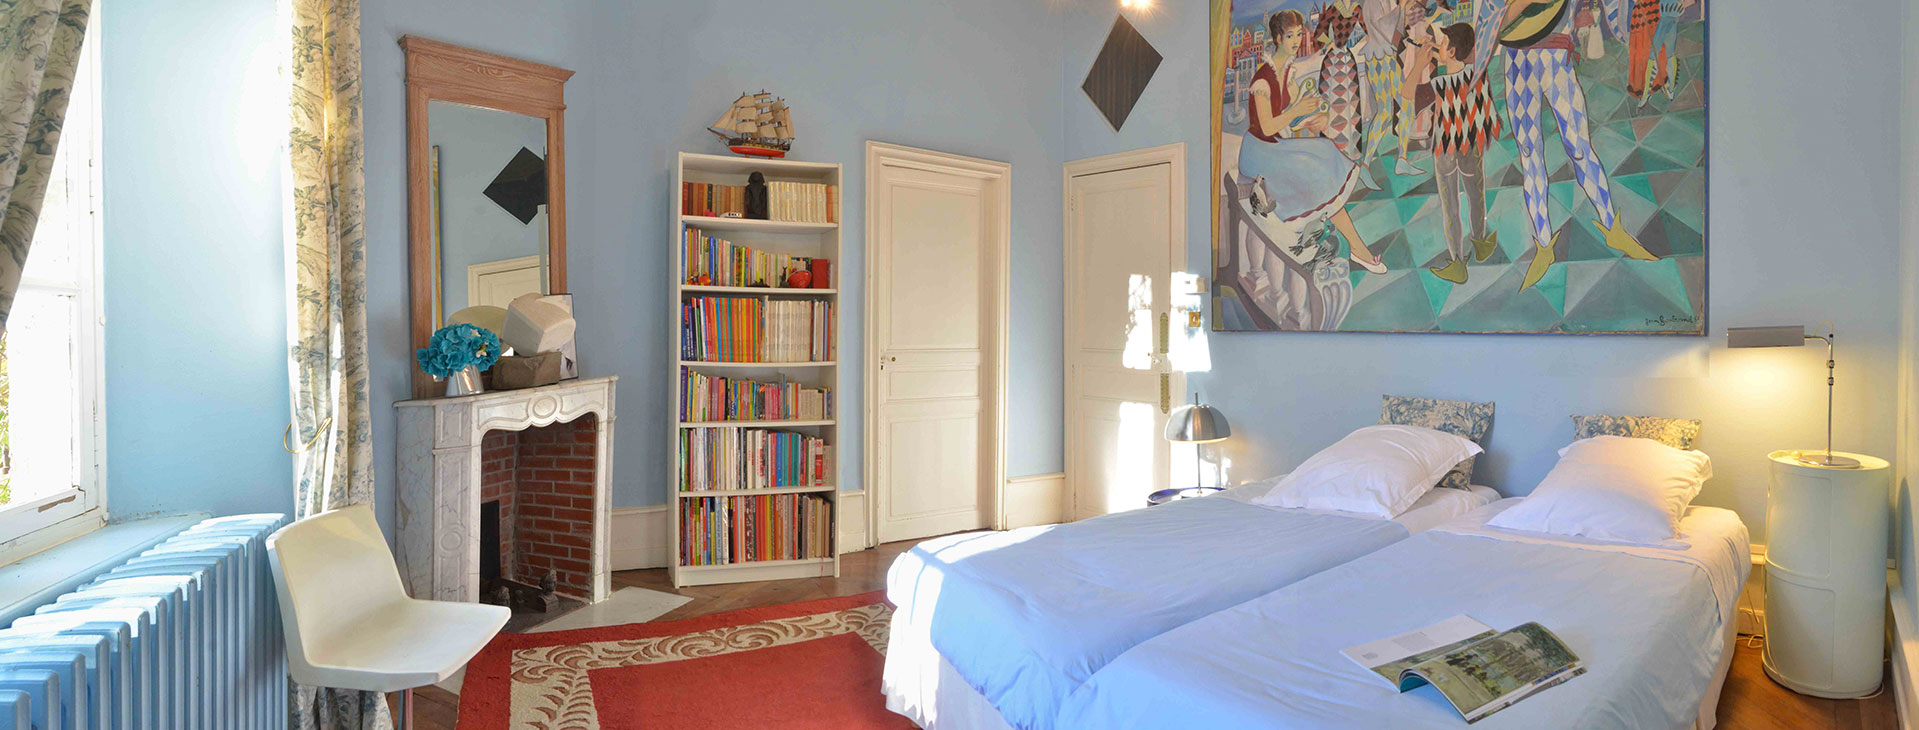 chambre Arlequin / Arlequin bedroom